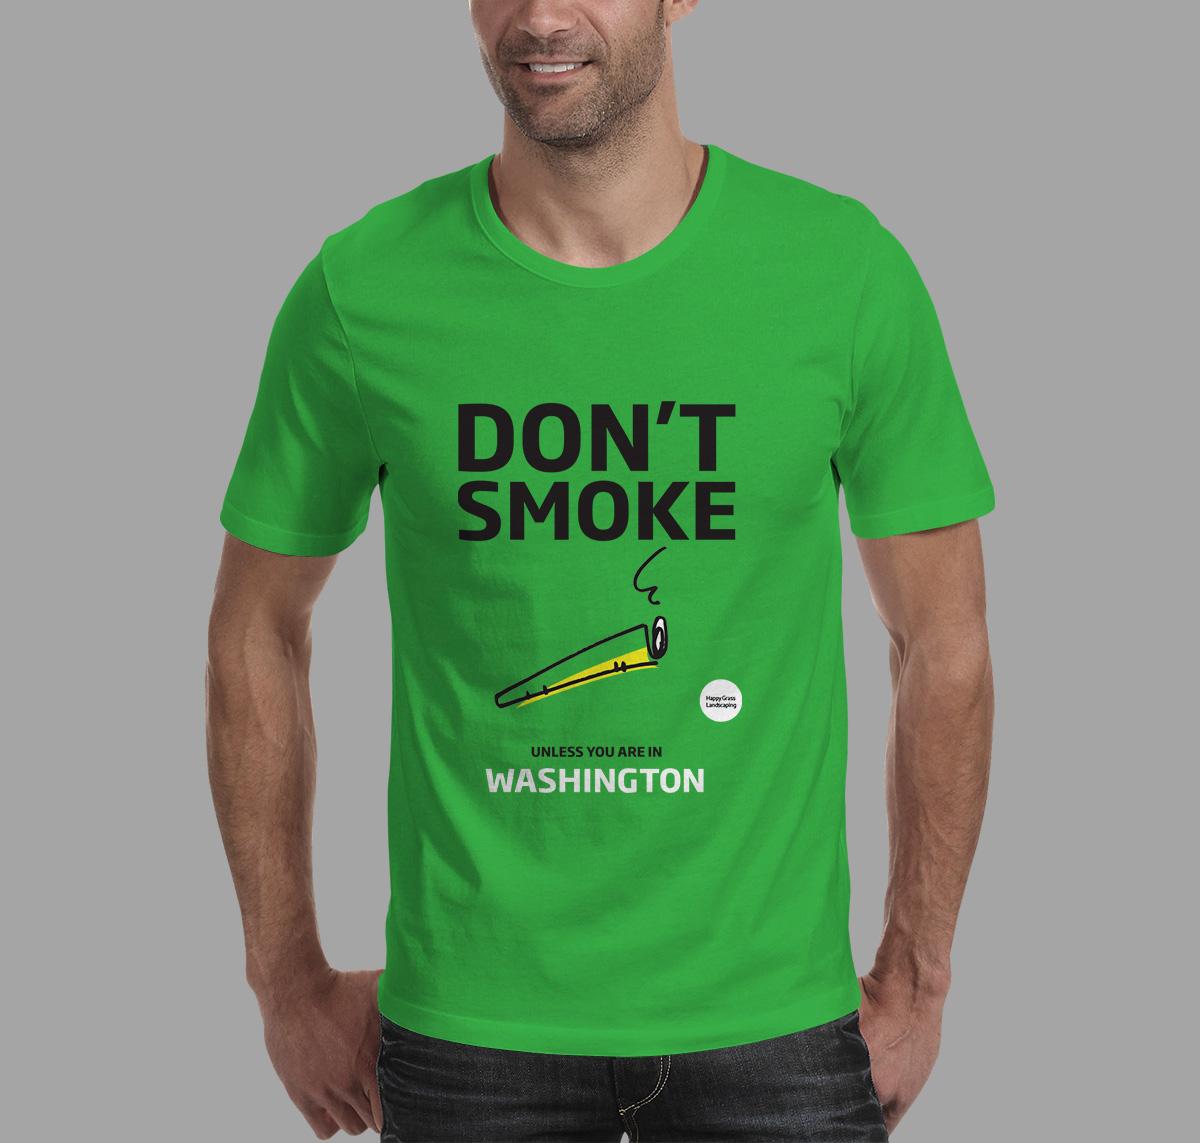 Playful, Colorful, Landscaping T-shirt Design for Shirt Hacker LLC in  United States | Design 4176093 - Playful, Colorful, Landscaping T-shirt Design For Shirt Hacker LLC